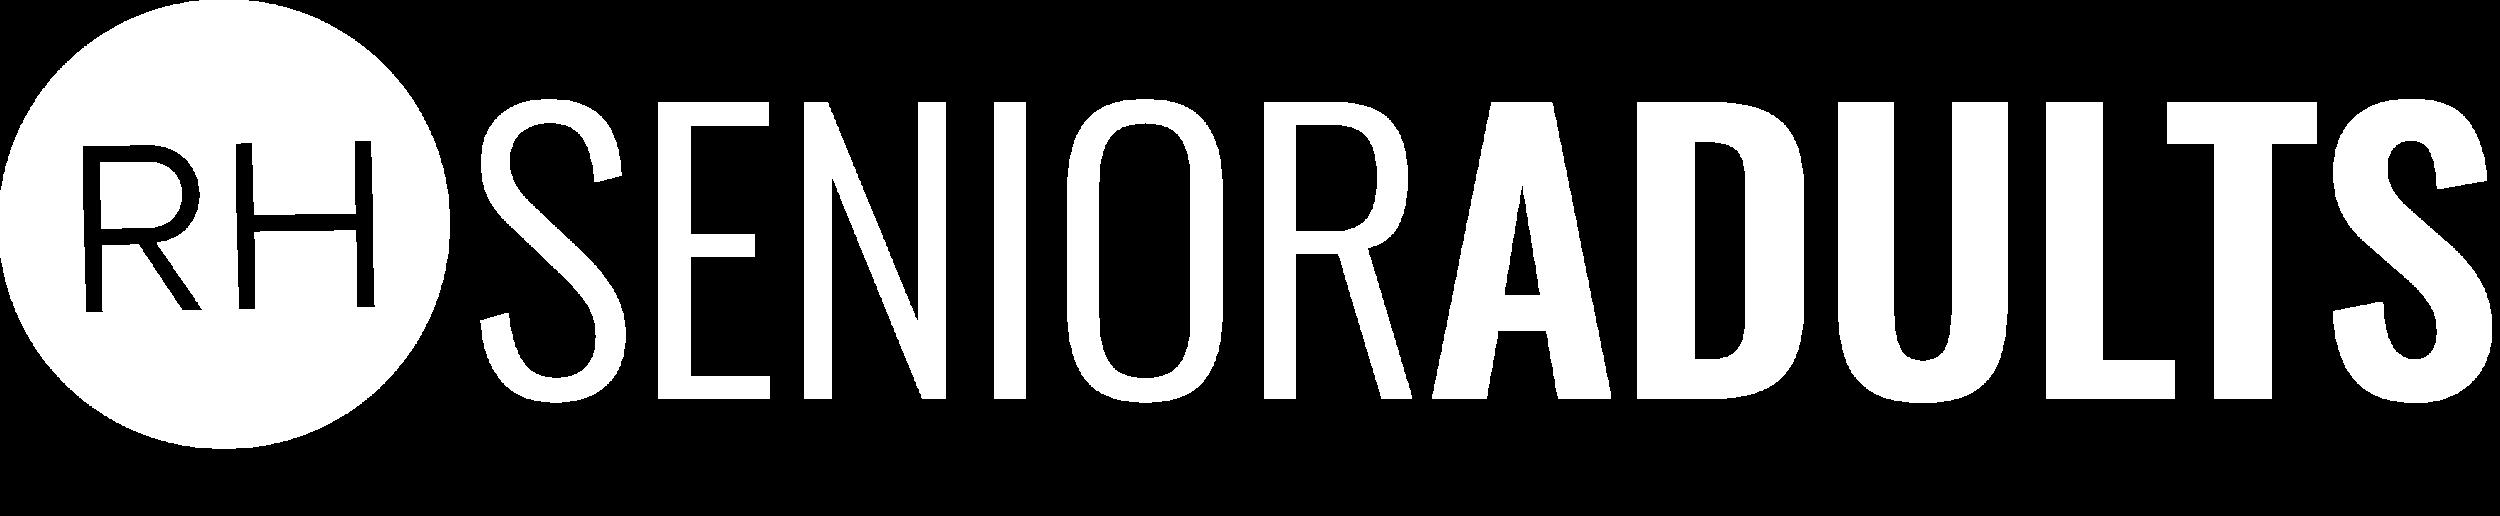 Senior Adults Logo_1@4x.png